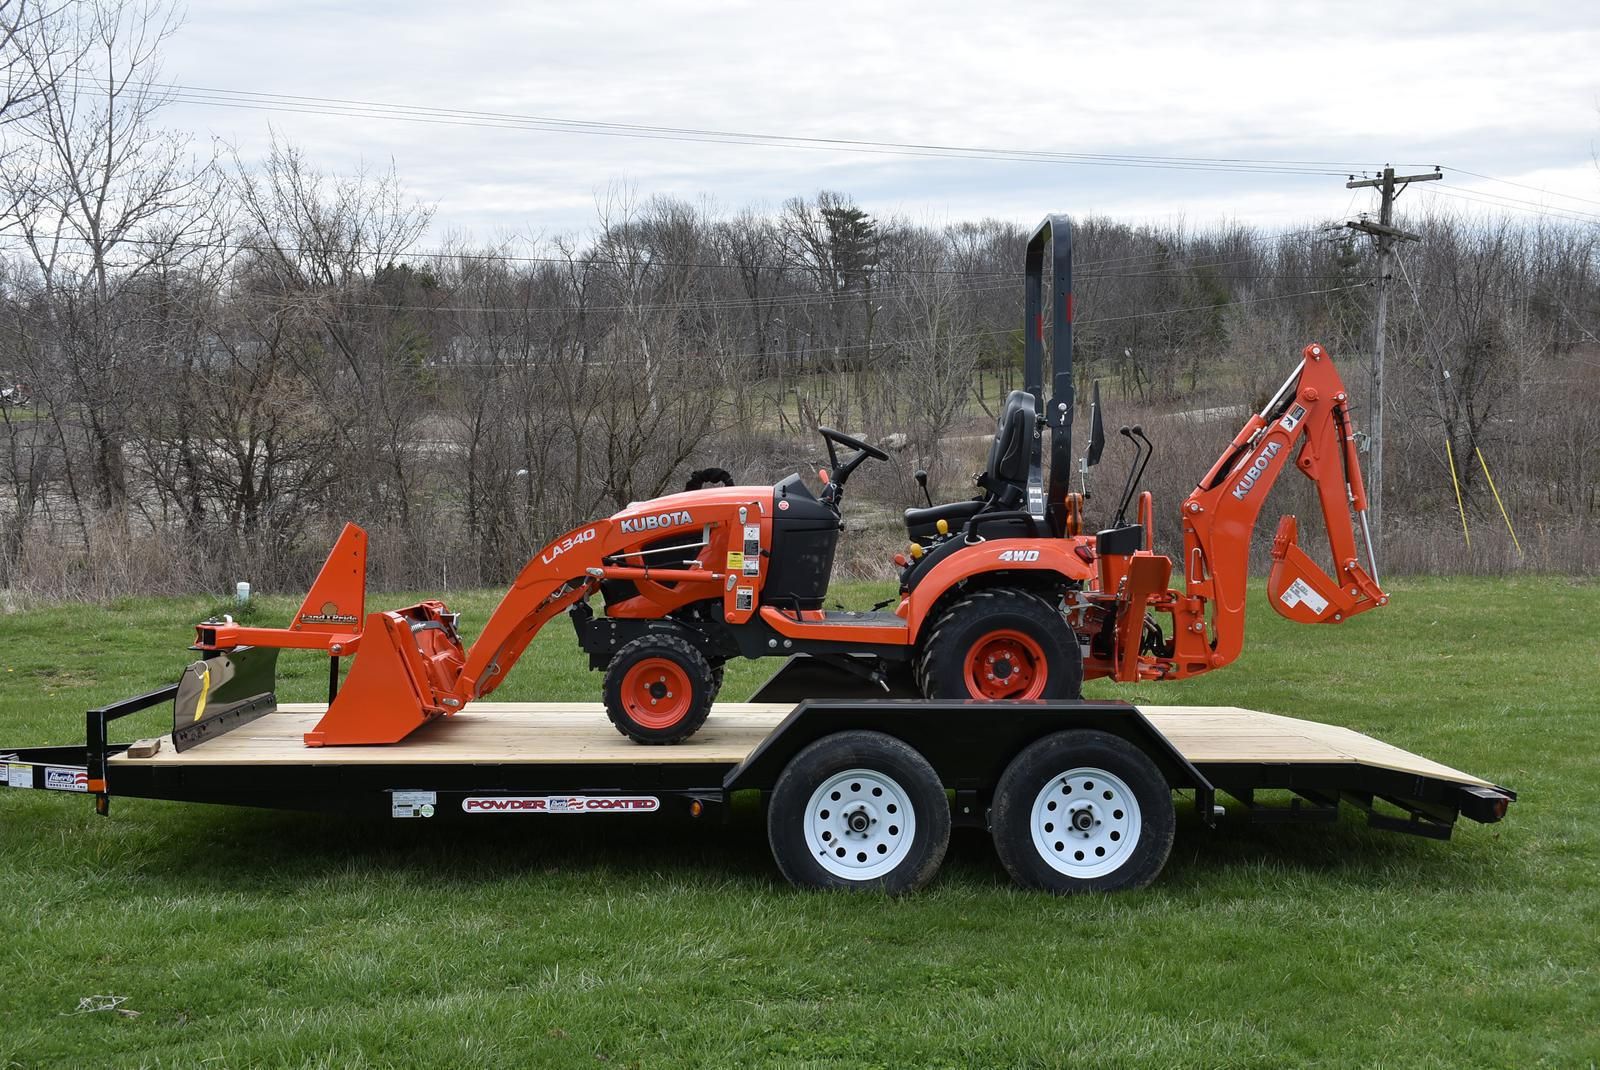 Kubota BX Series Tractor Package German-Bliss Equipment, Inc